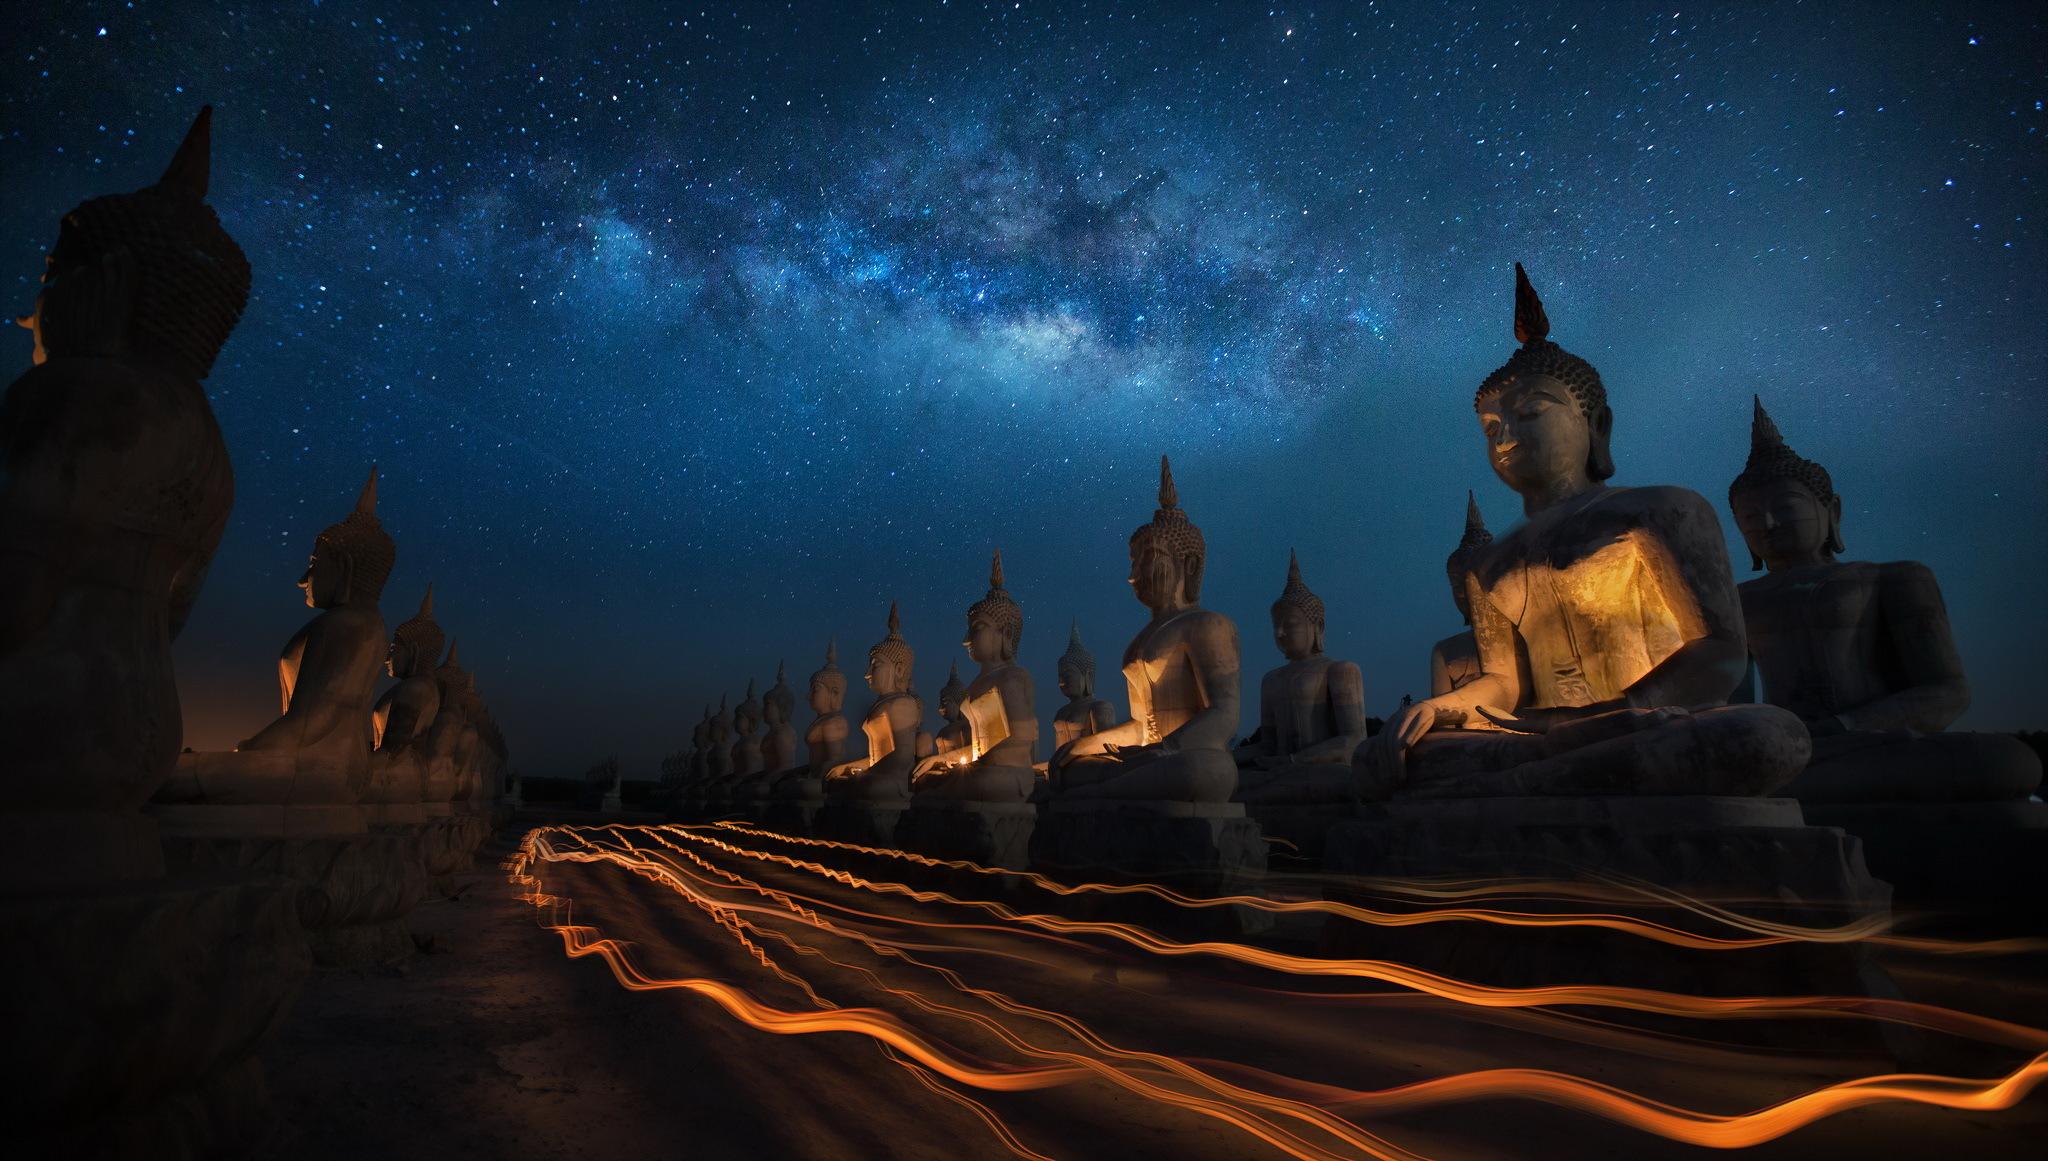 Must see Wallpaper Night God - statue-stars-Buddha-Buddhism-light-trails-1144953  Picture-682764.jpg